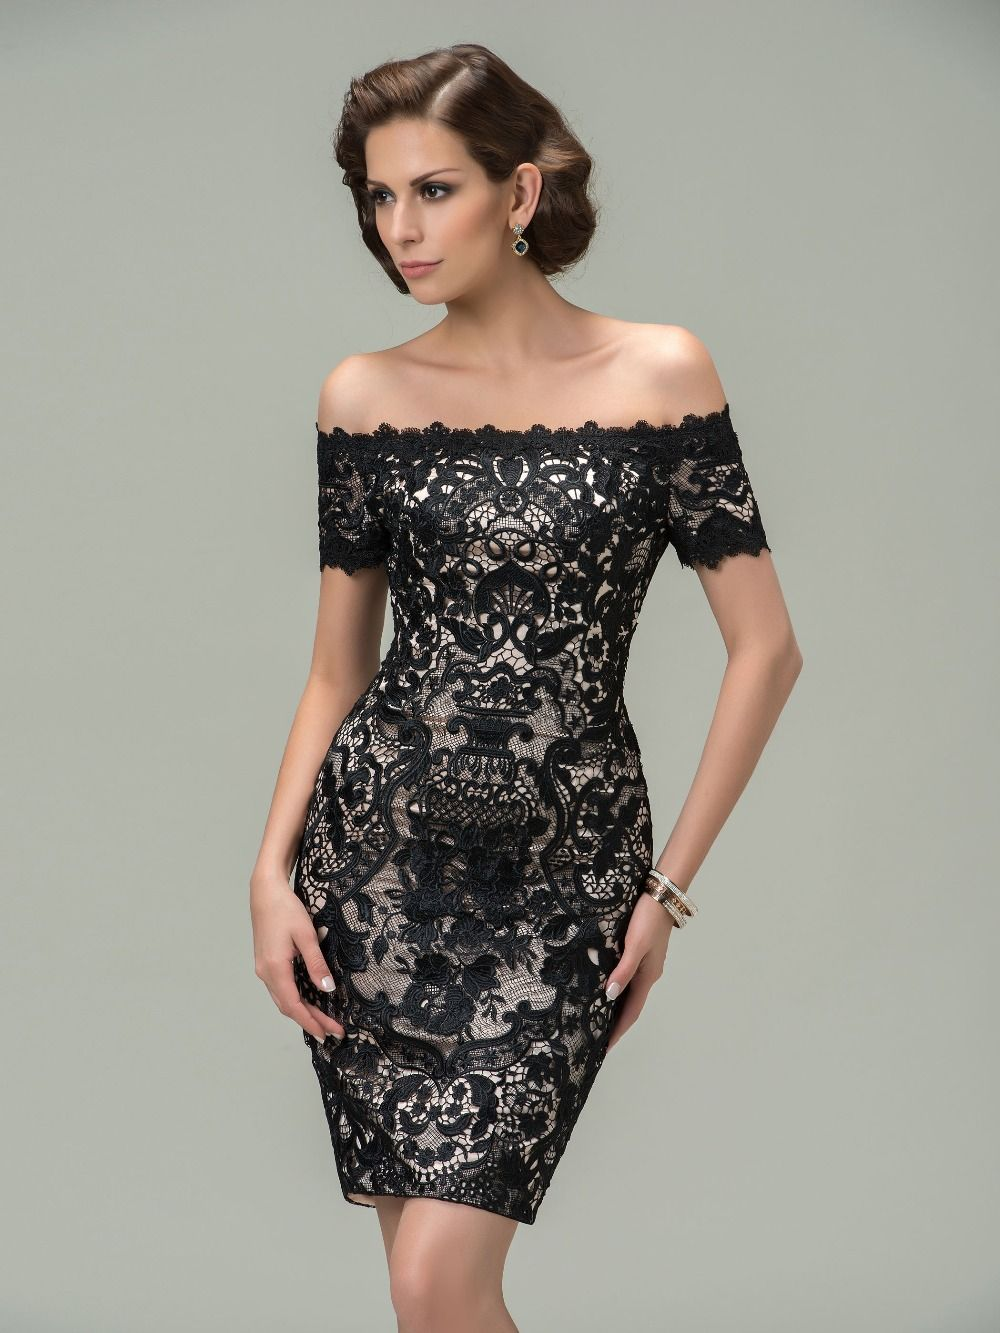 Trendy-Short-Black-Lace-Cocktail- | Fashion | Pinterest | Shorts ...